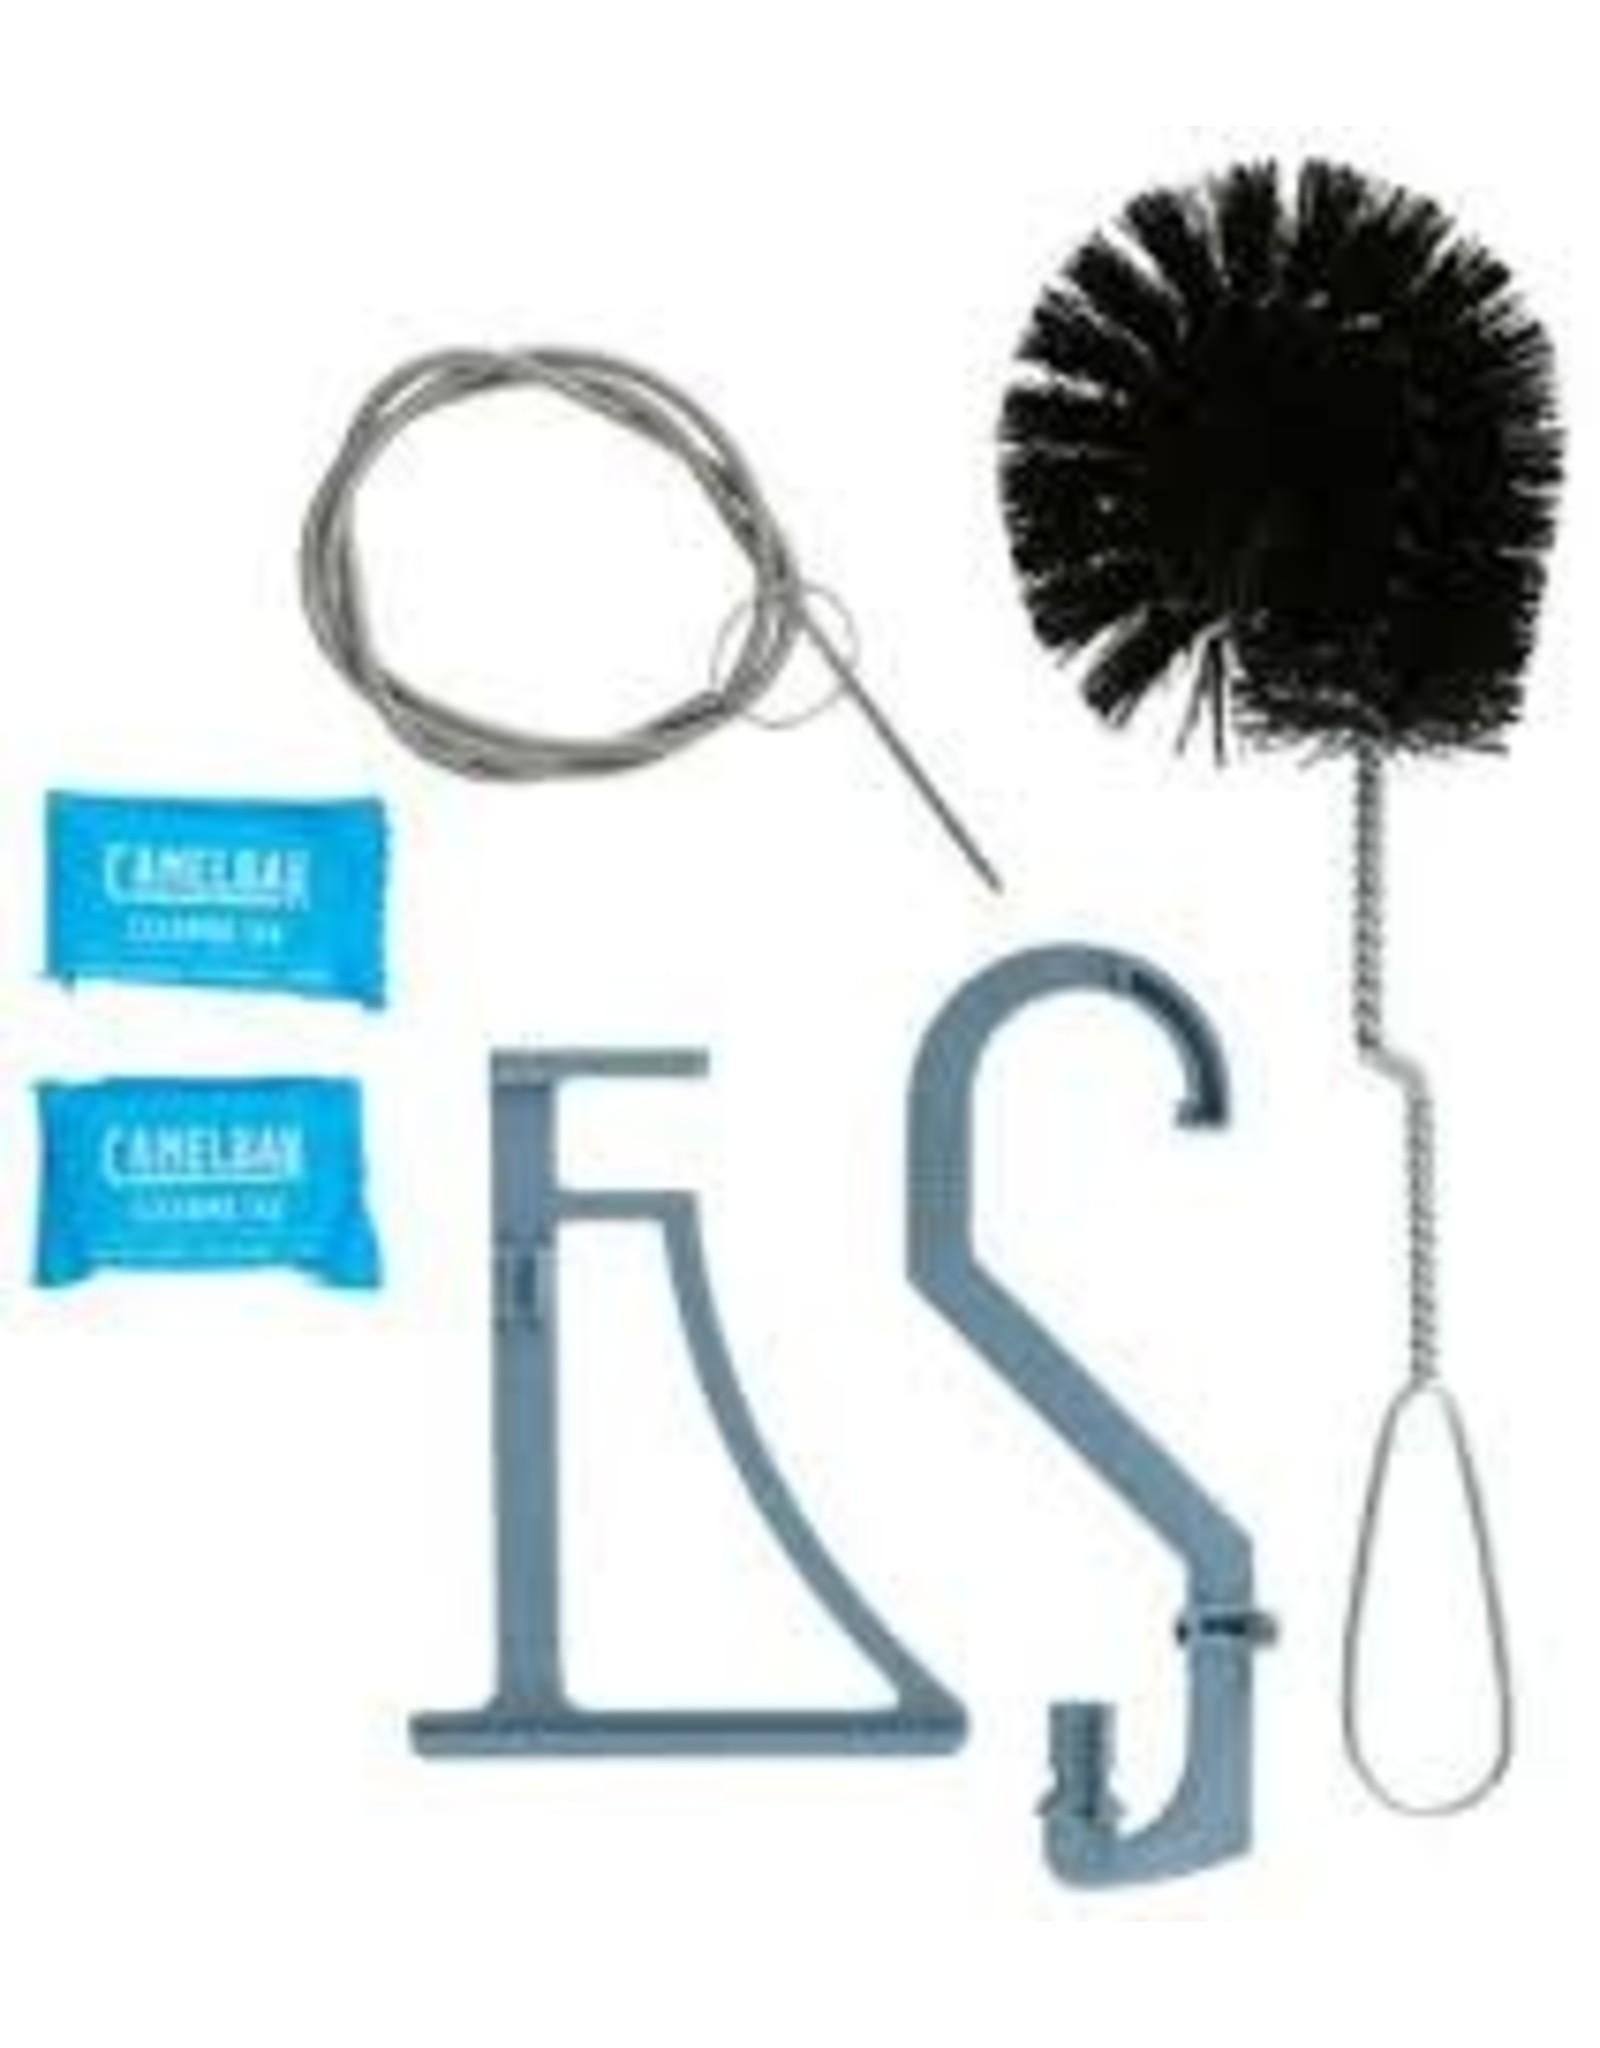 Camelbak Camelbak Crux Cleaning Kit